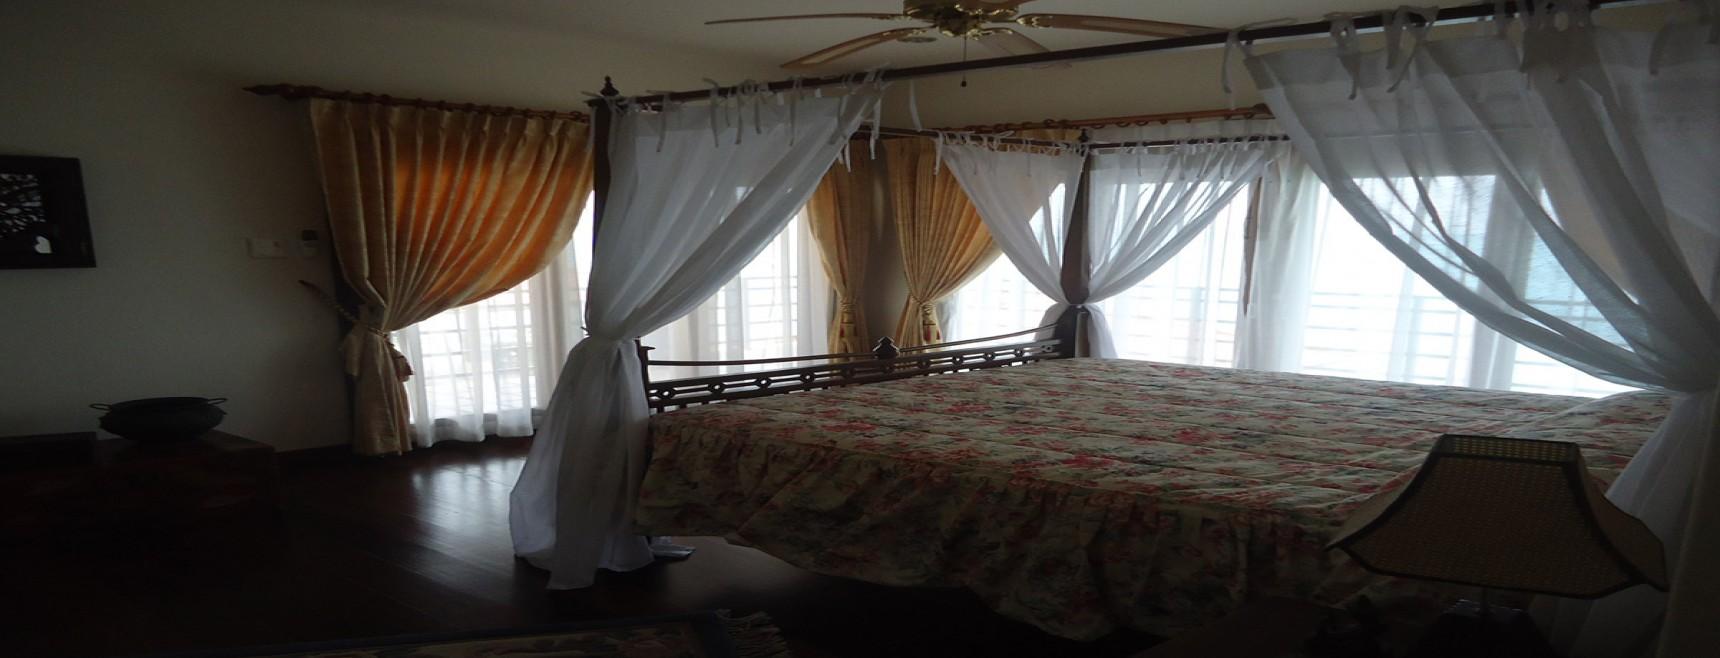 4 Bedrooms, Villa, Residential Sales, 4 Bathrooms, Listing ID 1385, Ban Tai, North West, Koh Samui,